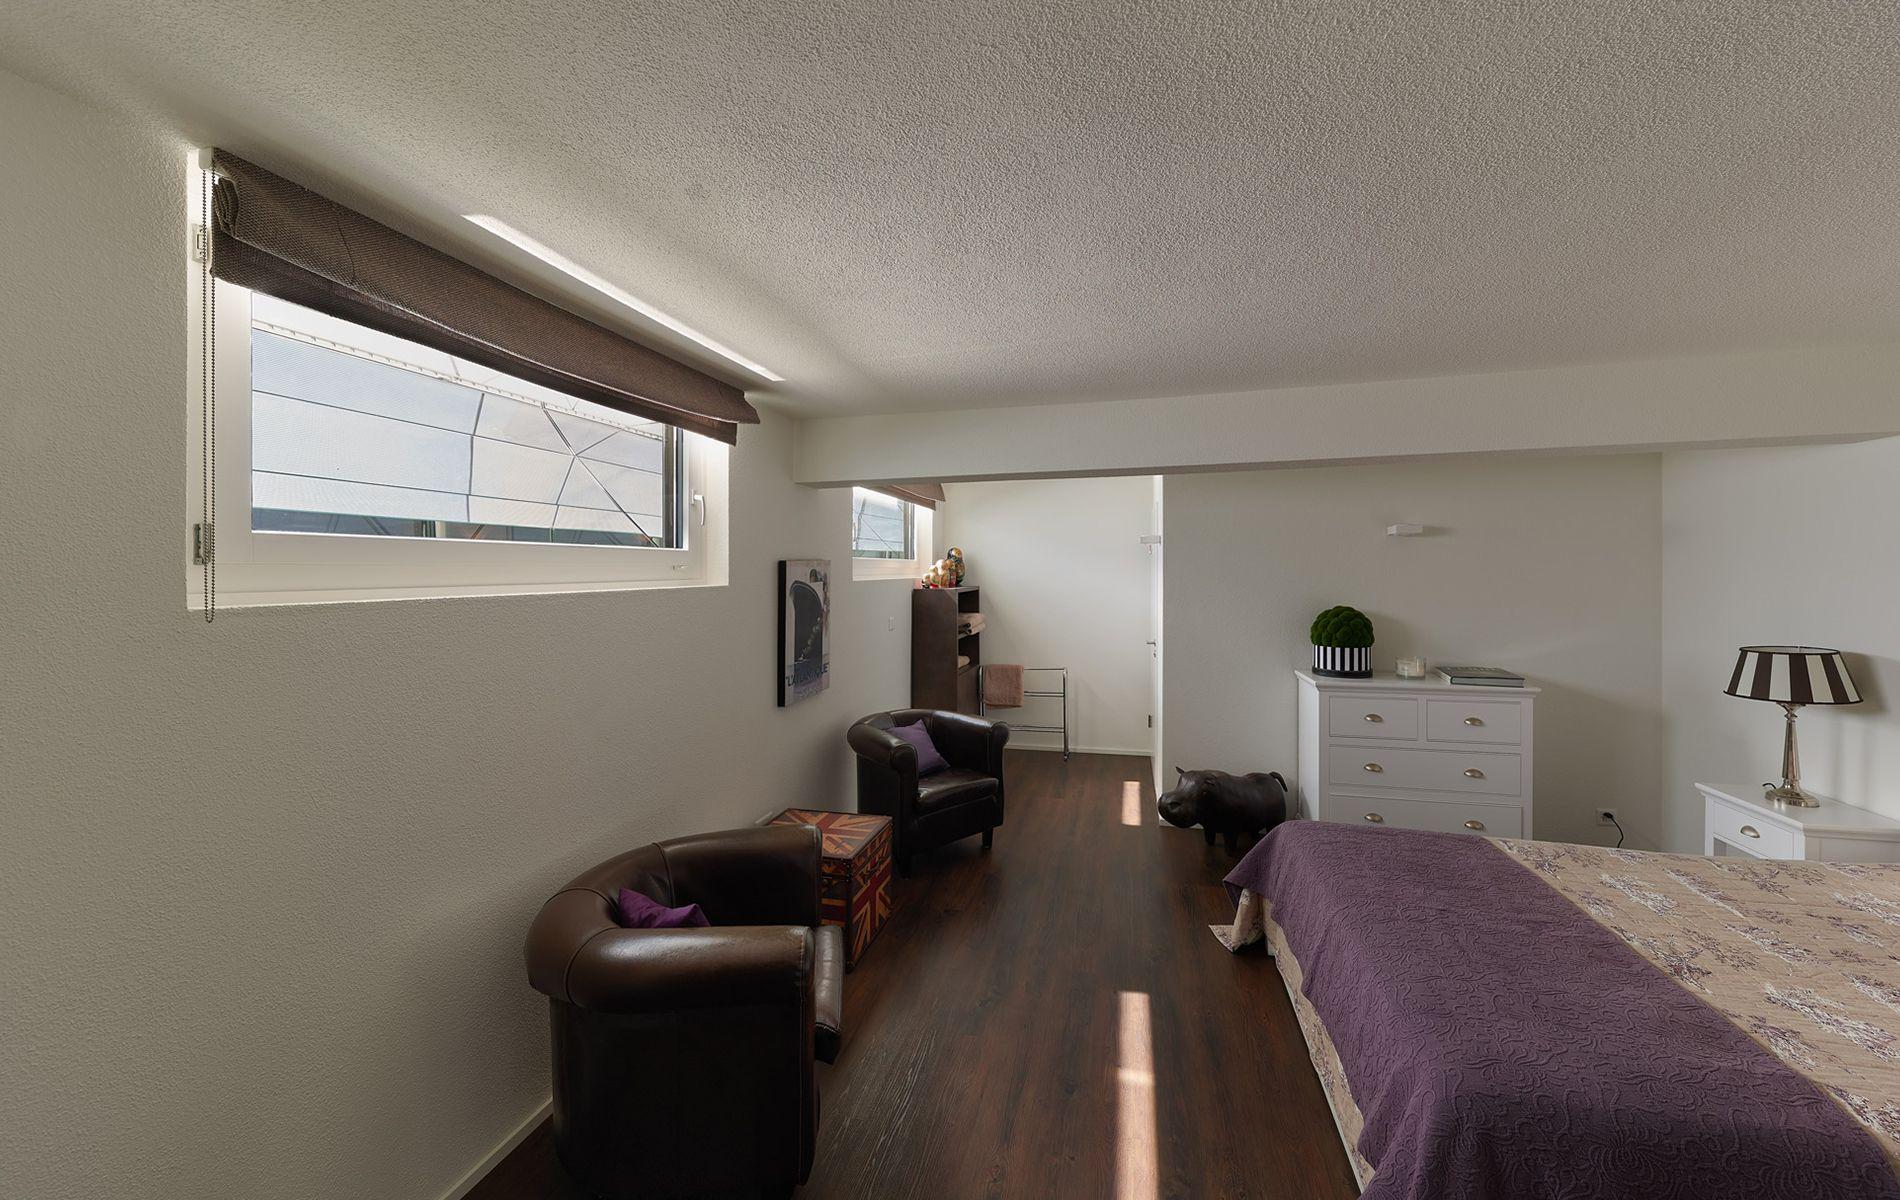 Loft bed ideas for low ceiling  Daylight in Basement rooms  Heliobus  Blue Butterflies in